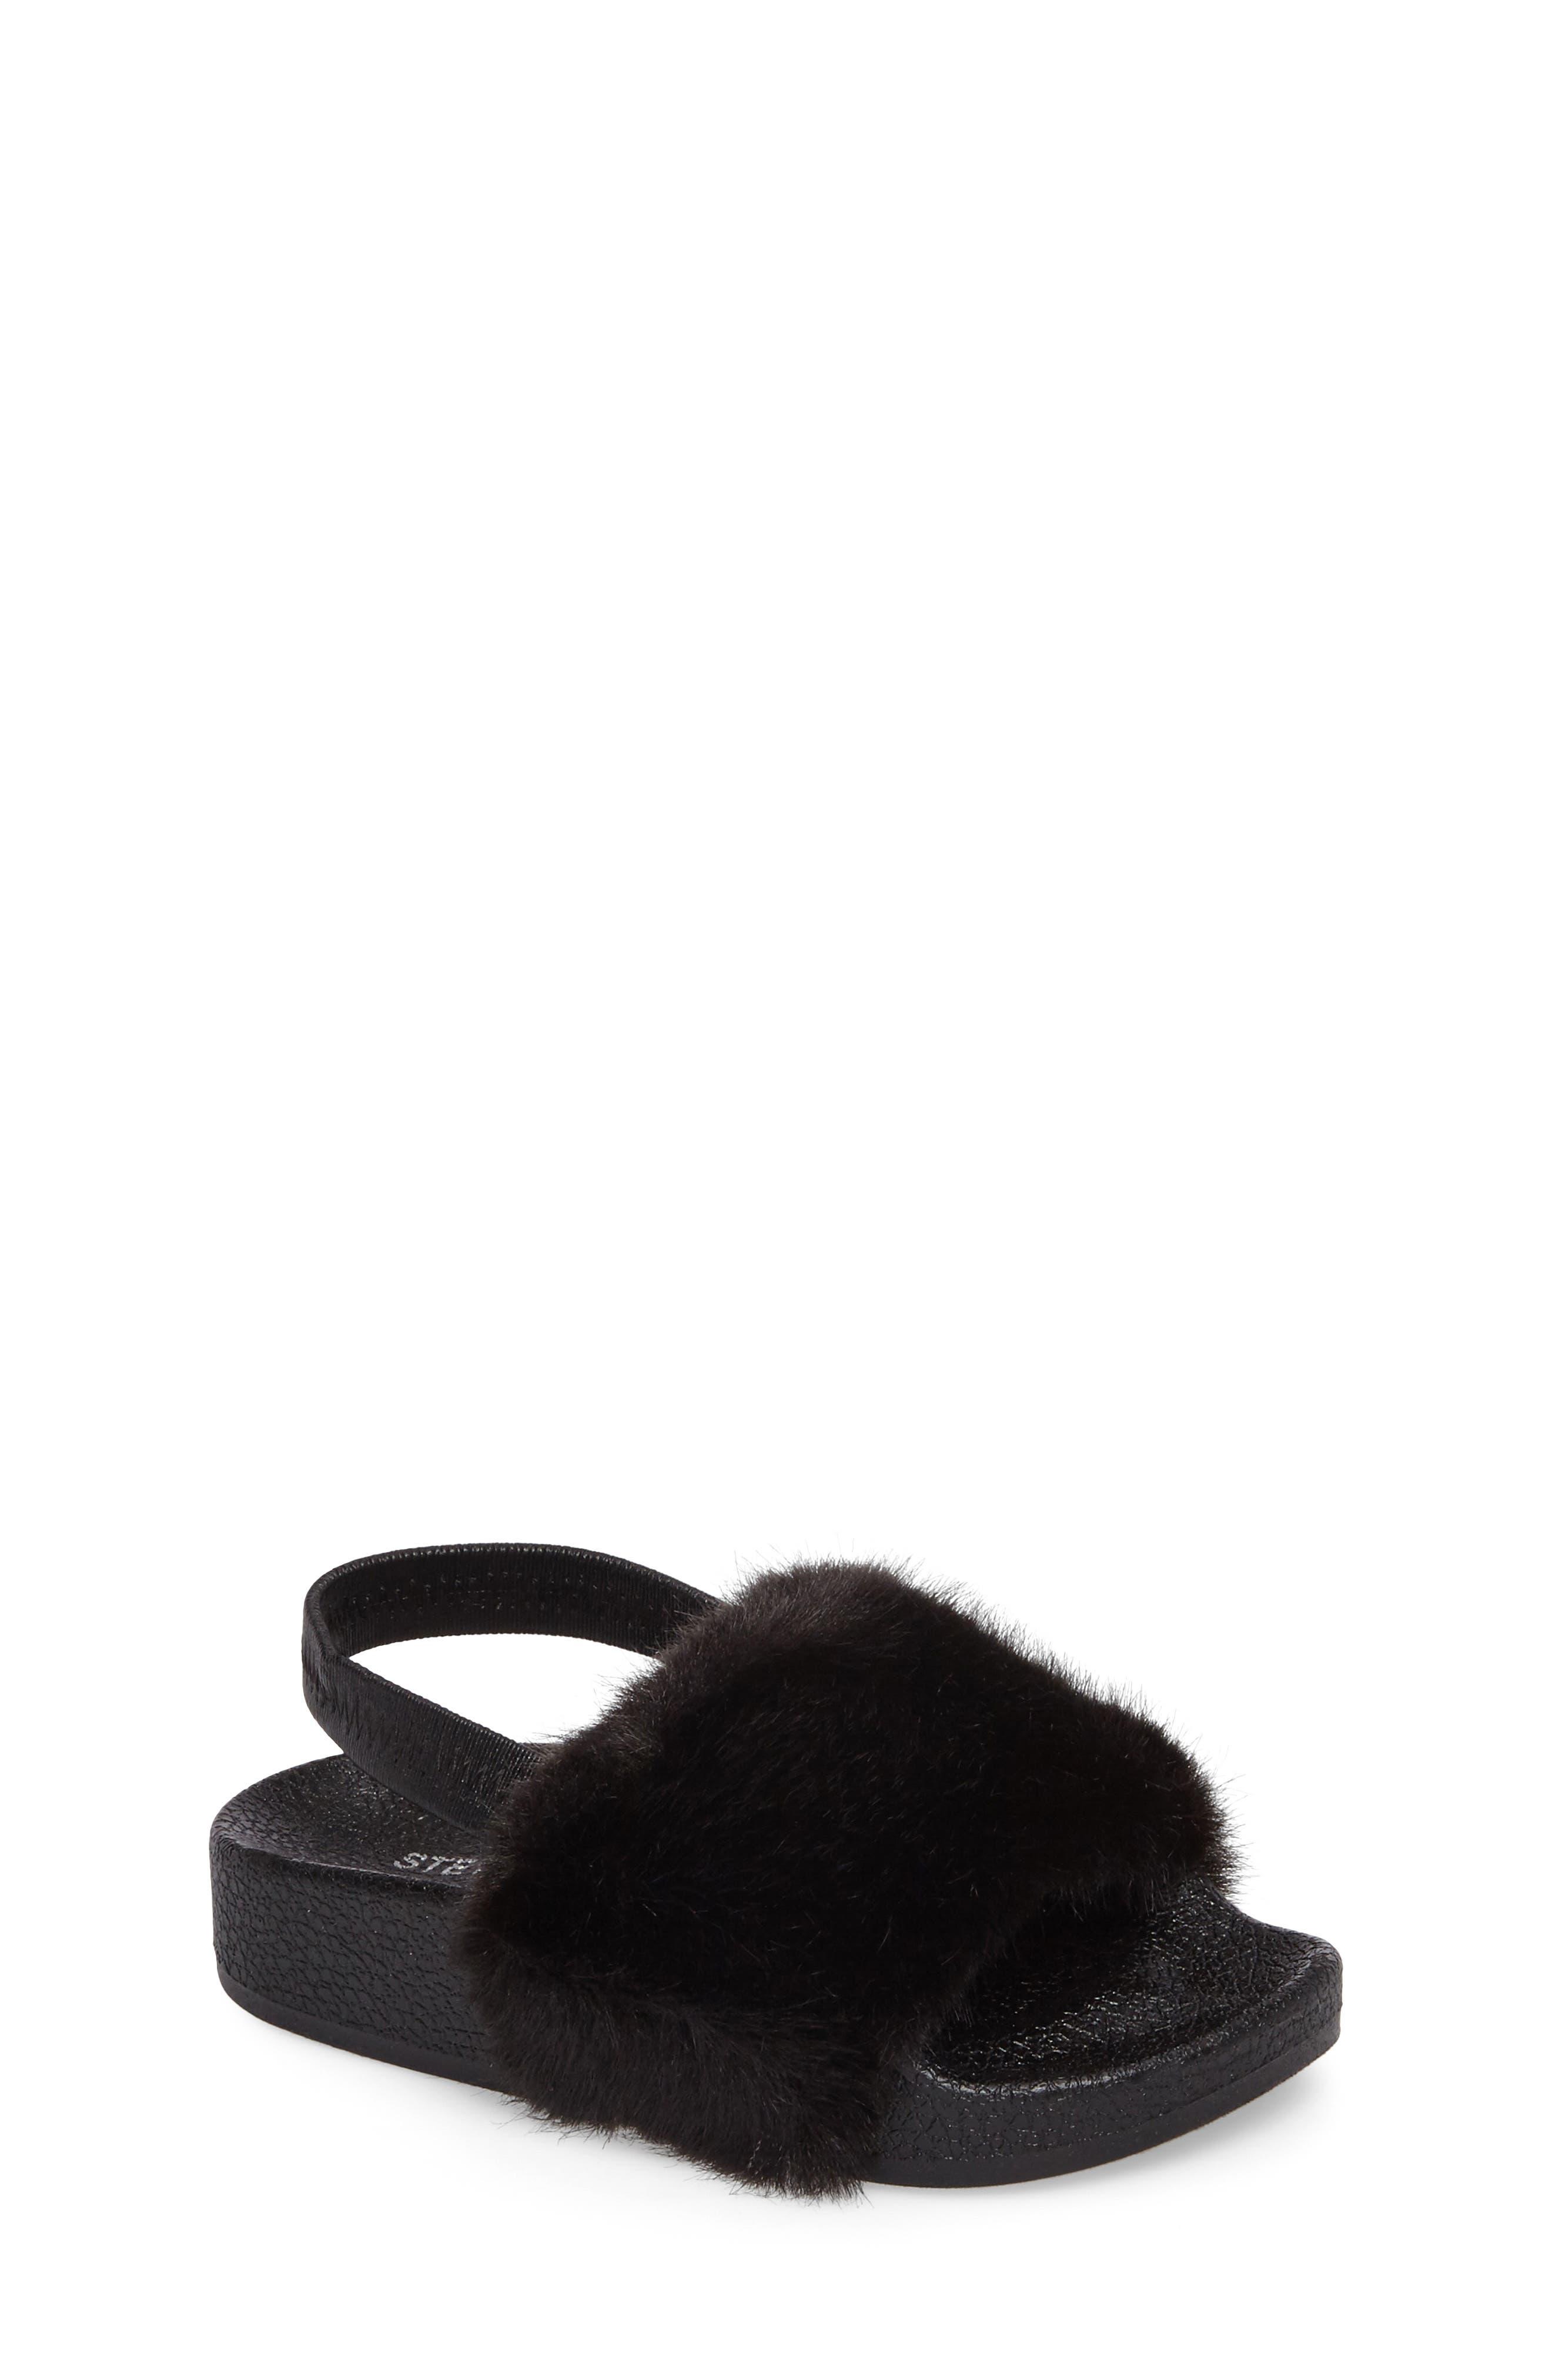 Tsoftey Faux Fur Slide Sandal,                         Main,                         color, 006